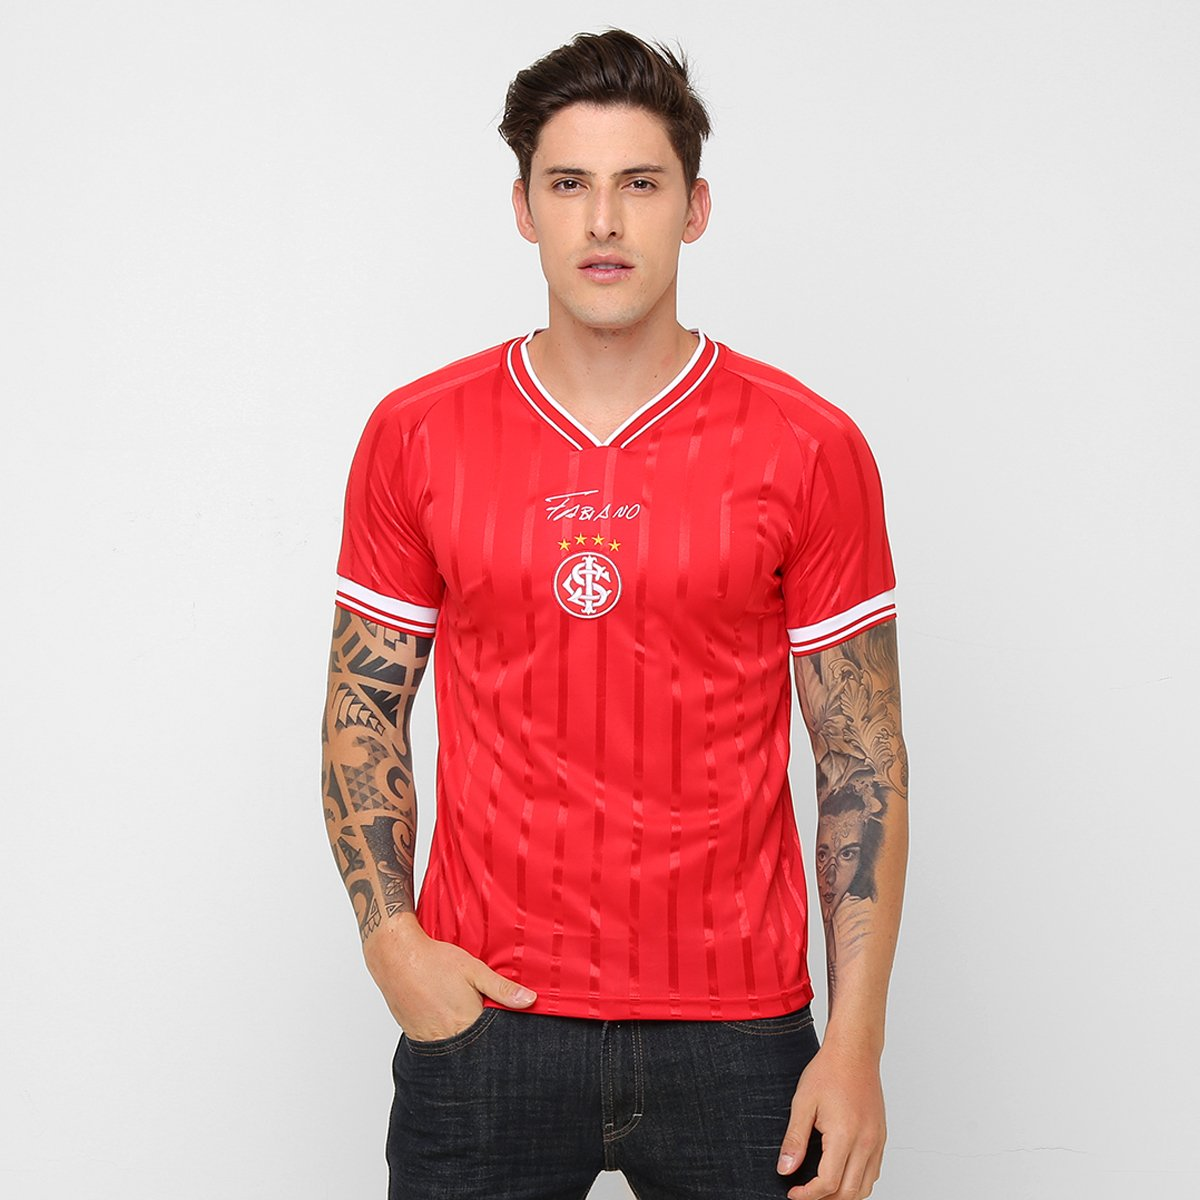 1c765141d6a Camiseta Internacional Alusiva Fabiano Souza Masculina - Compre Agora